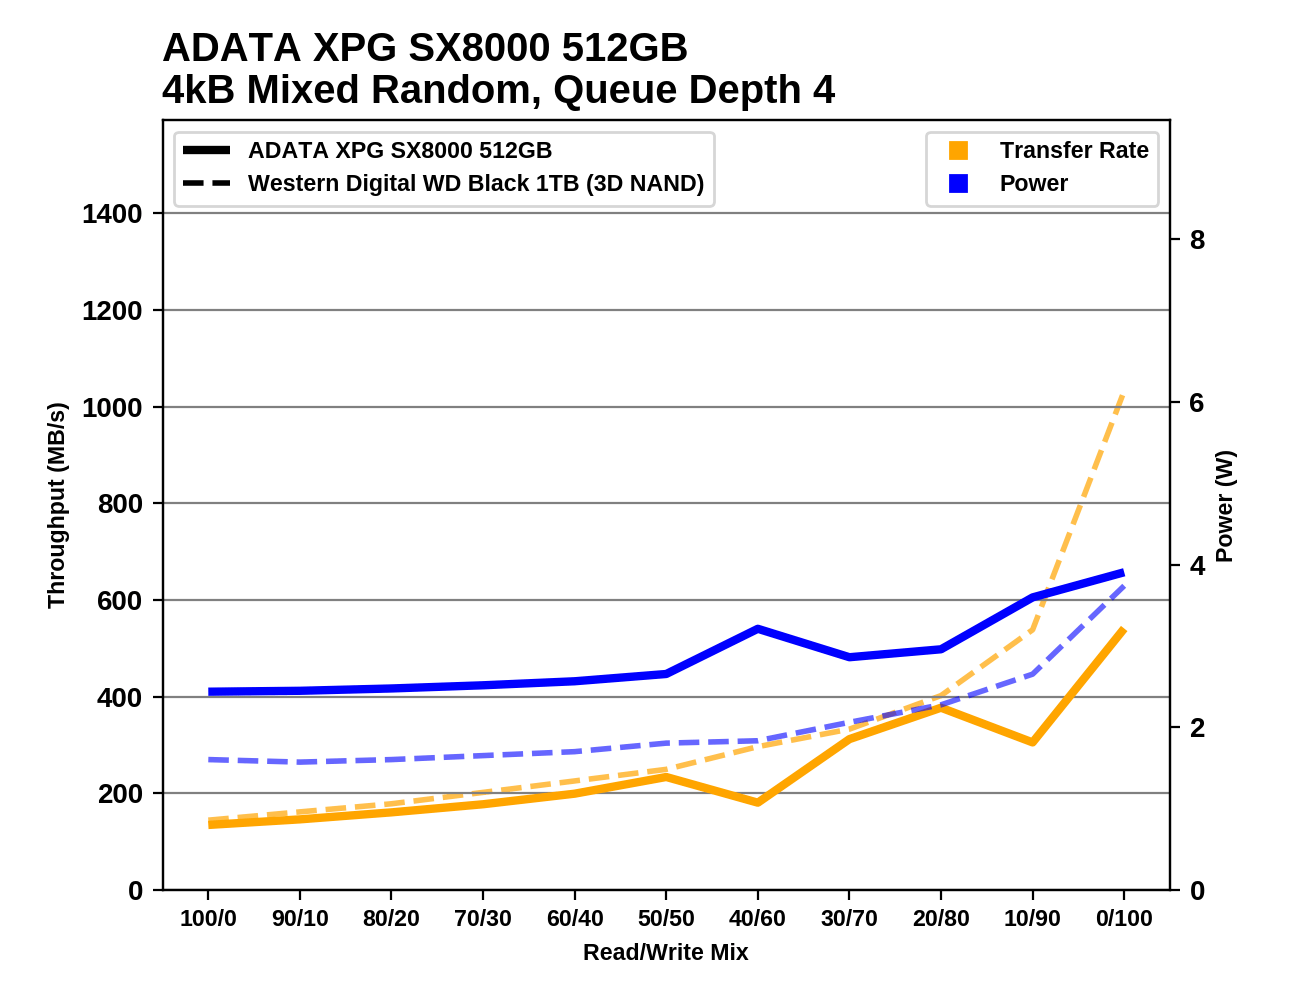 Обзор Western Digital WD Black 3D NAND SSD: EVO встретил равного - 120